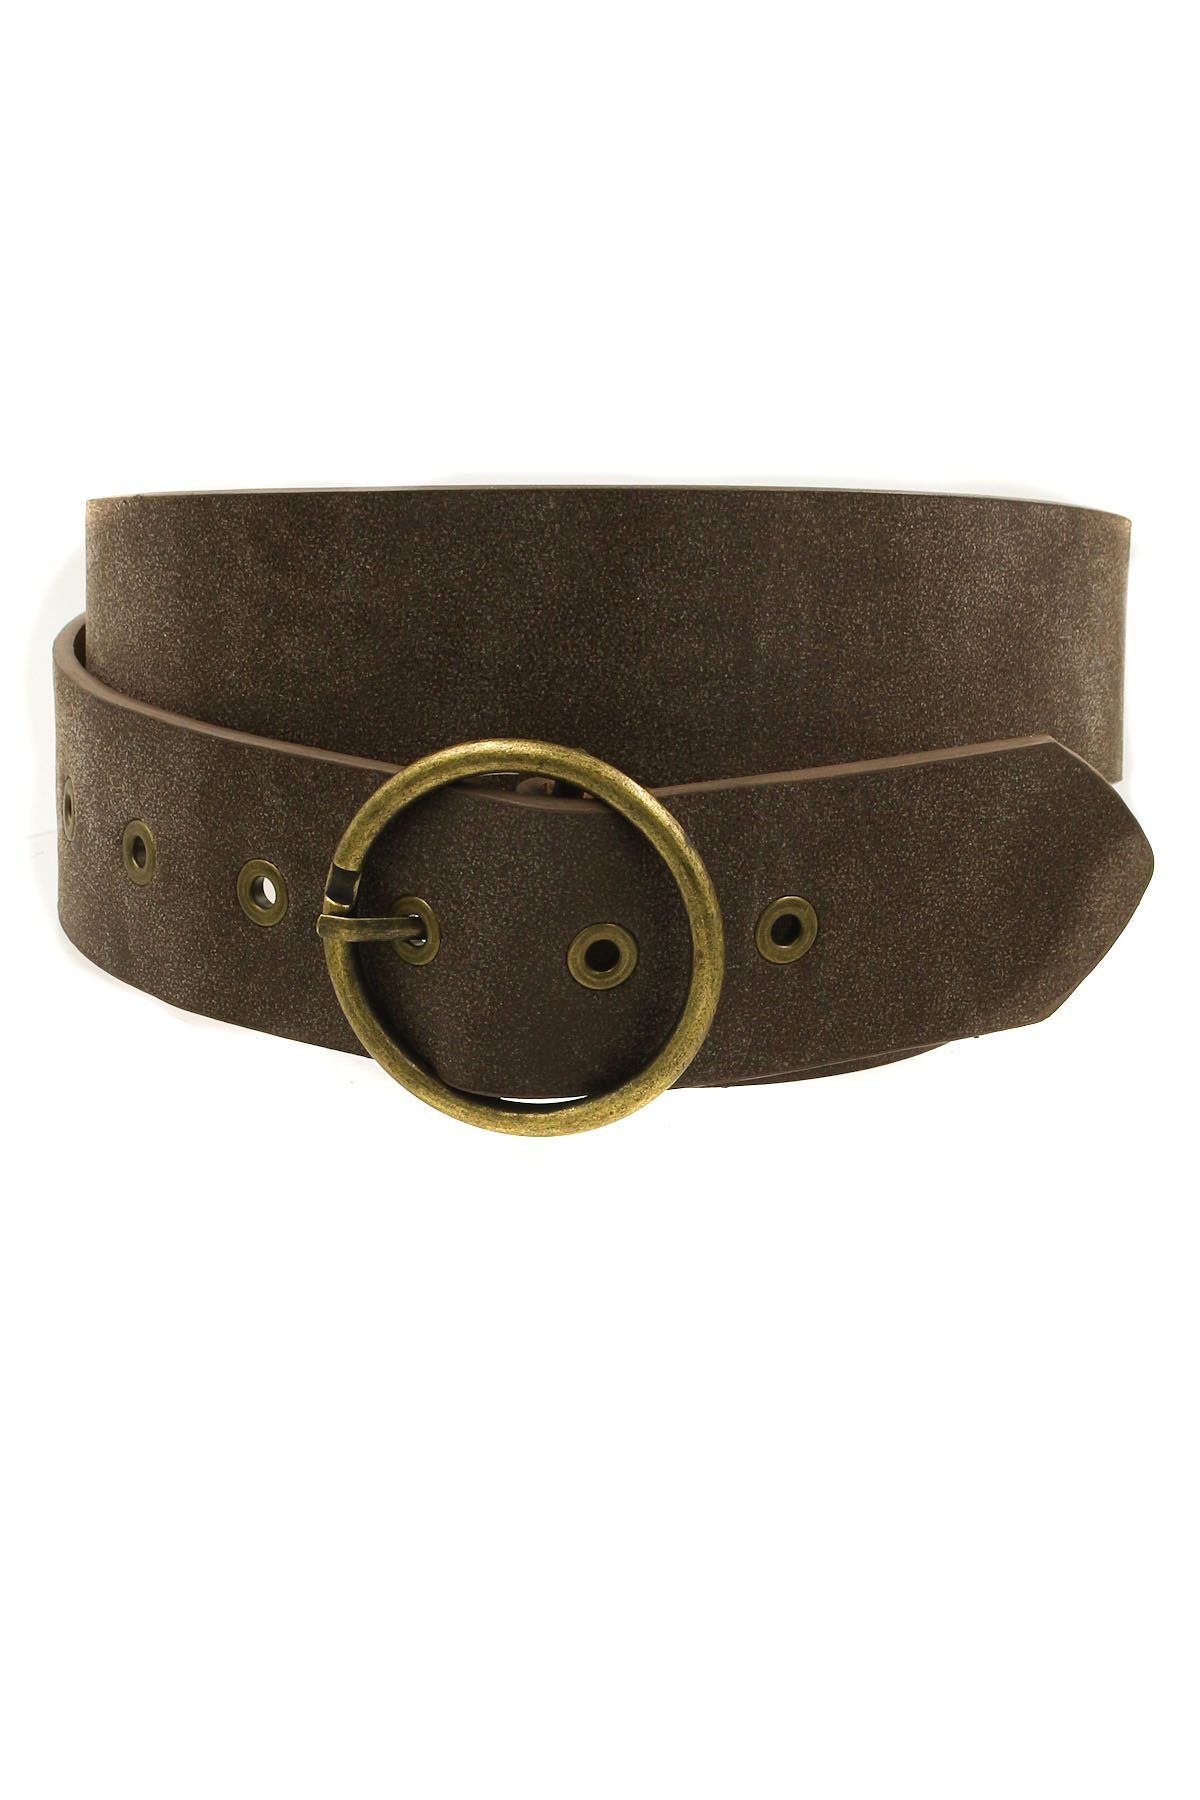 grommeted faux leather belt belts